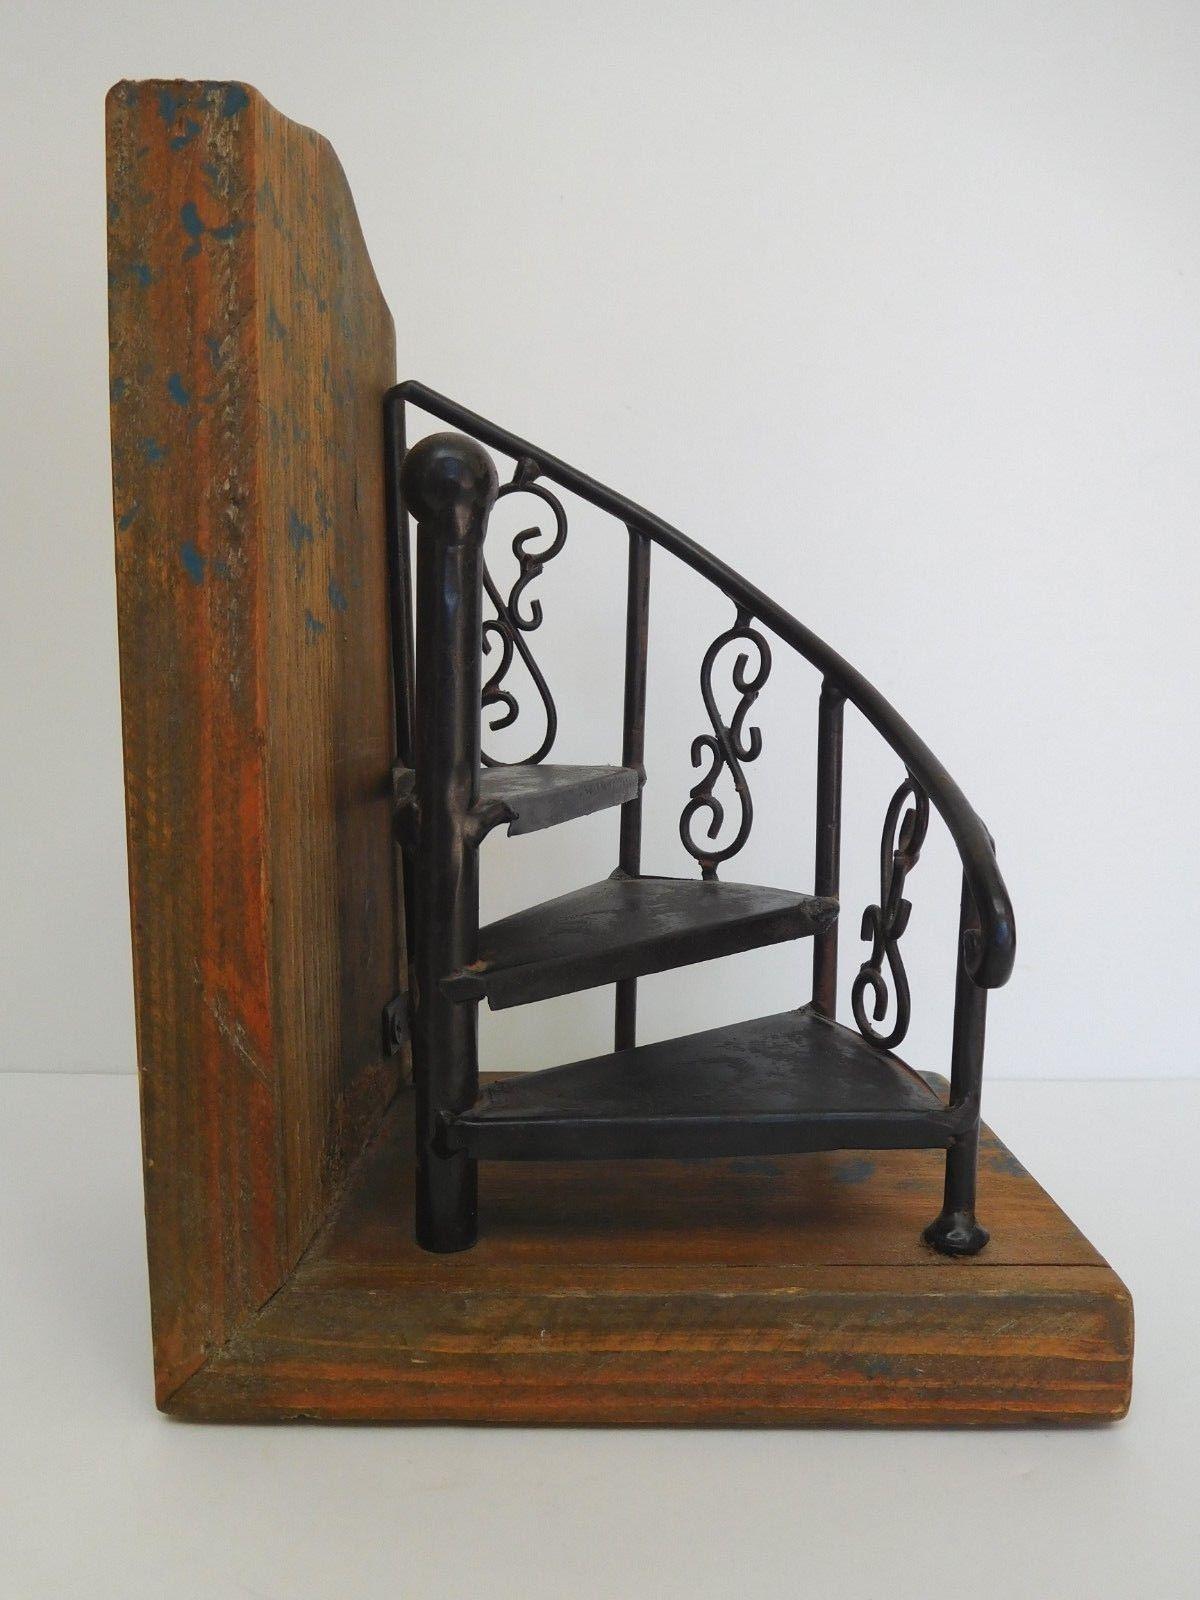 Best Wooden Metal Spiral Staircase Bookend Decor Figurine 400 x 300